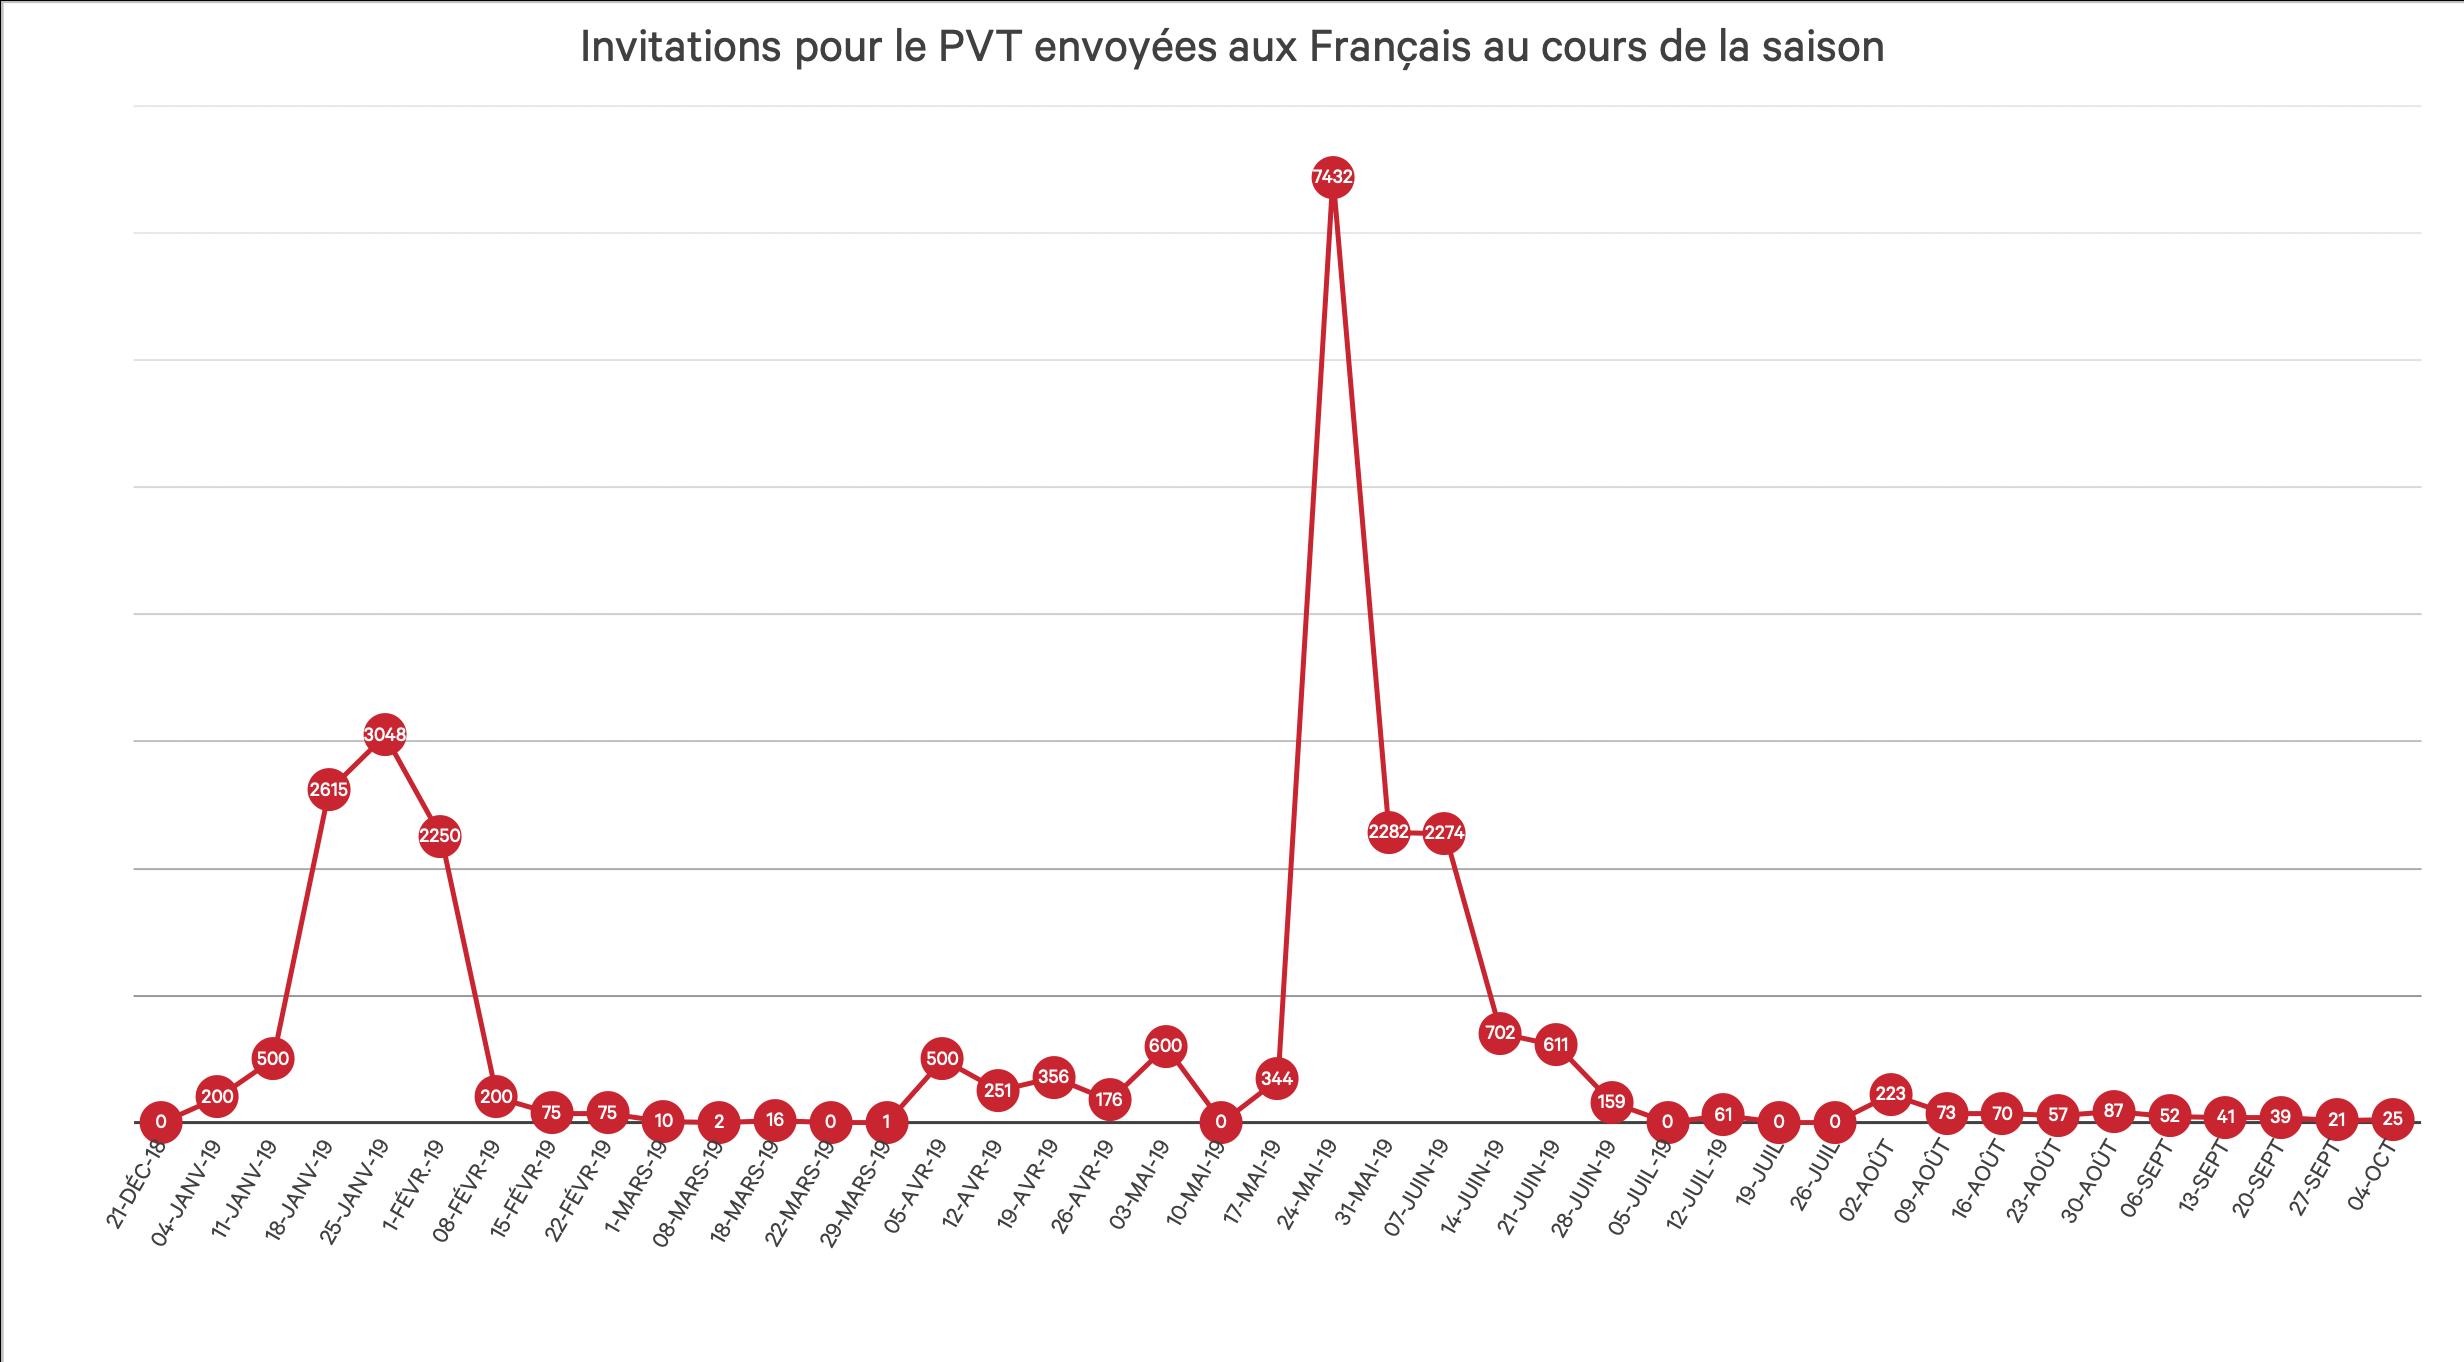 Invitations-PVT- France-2019